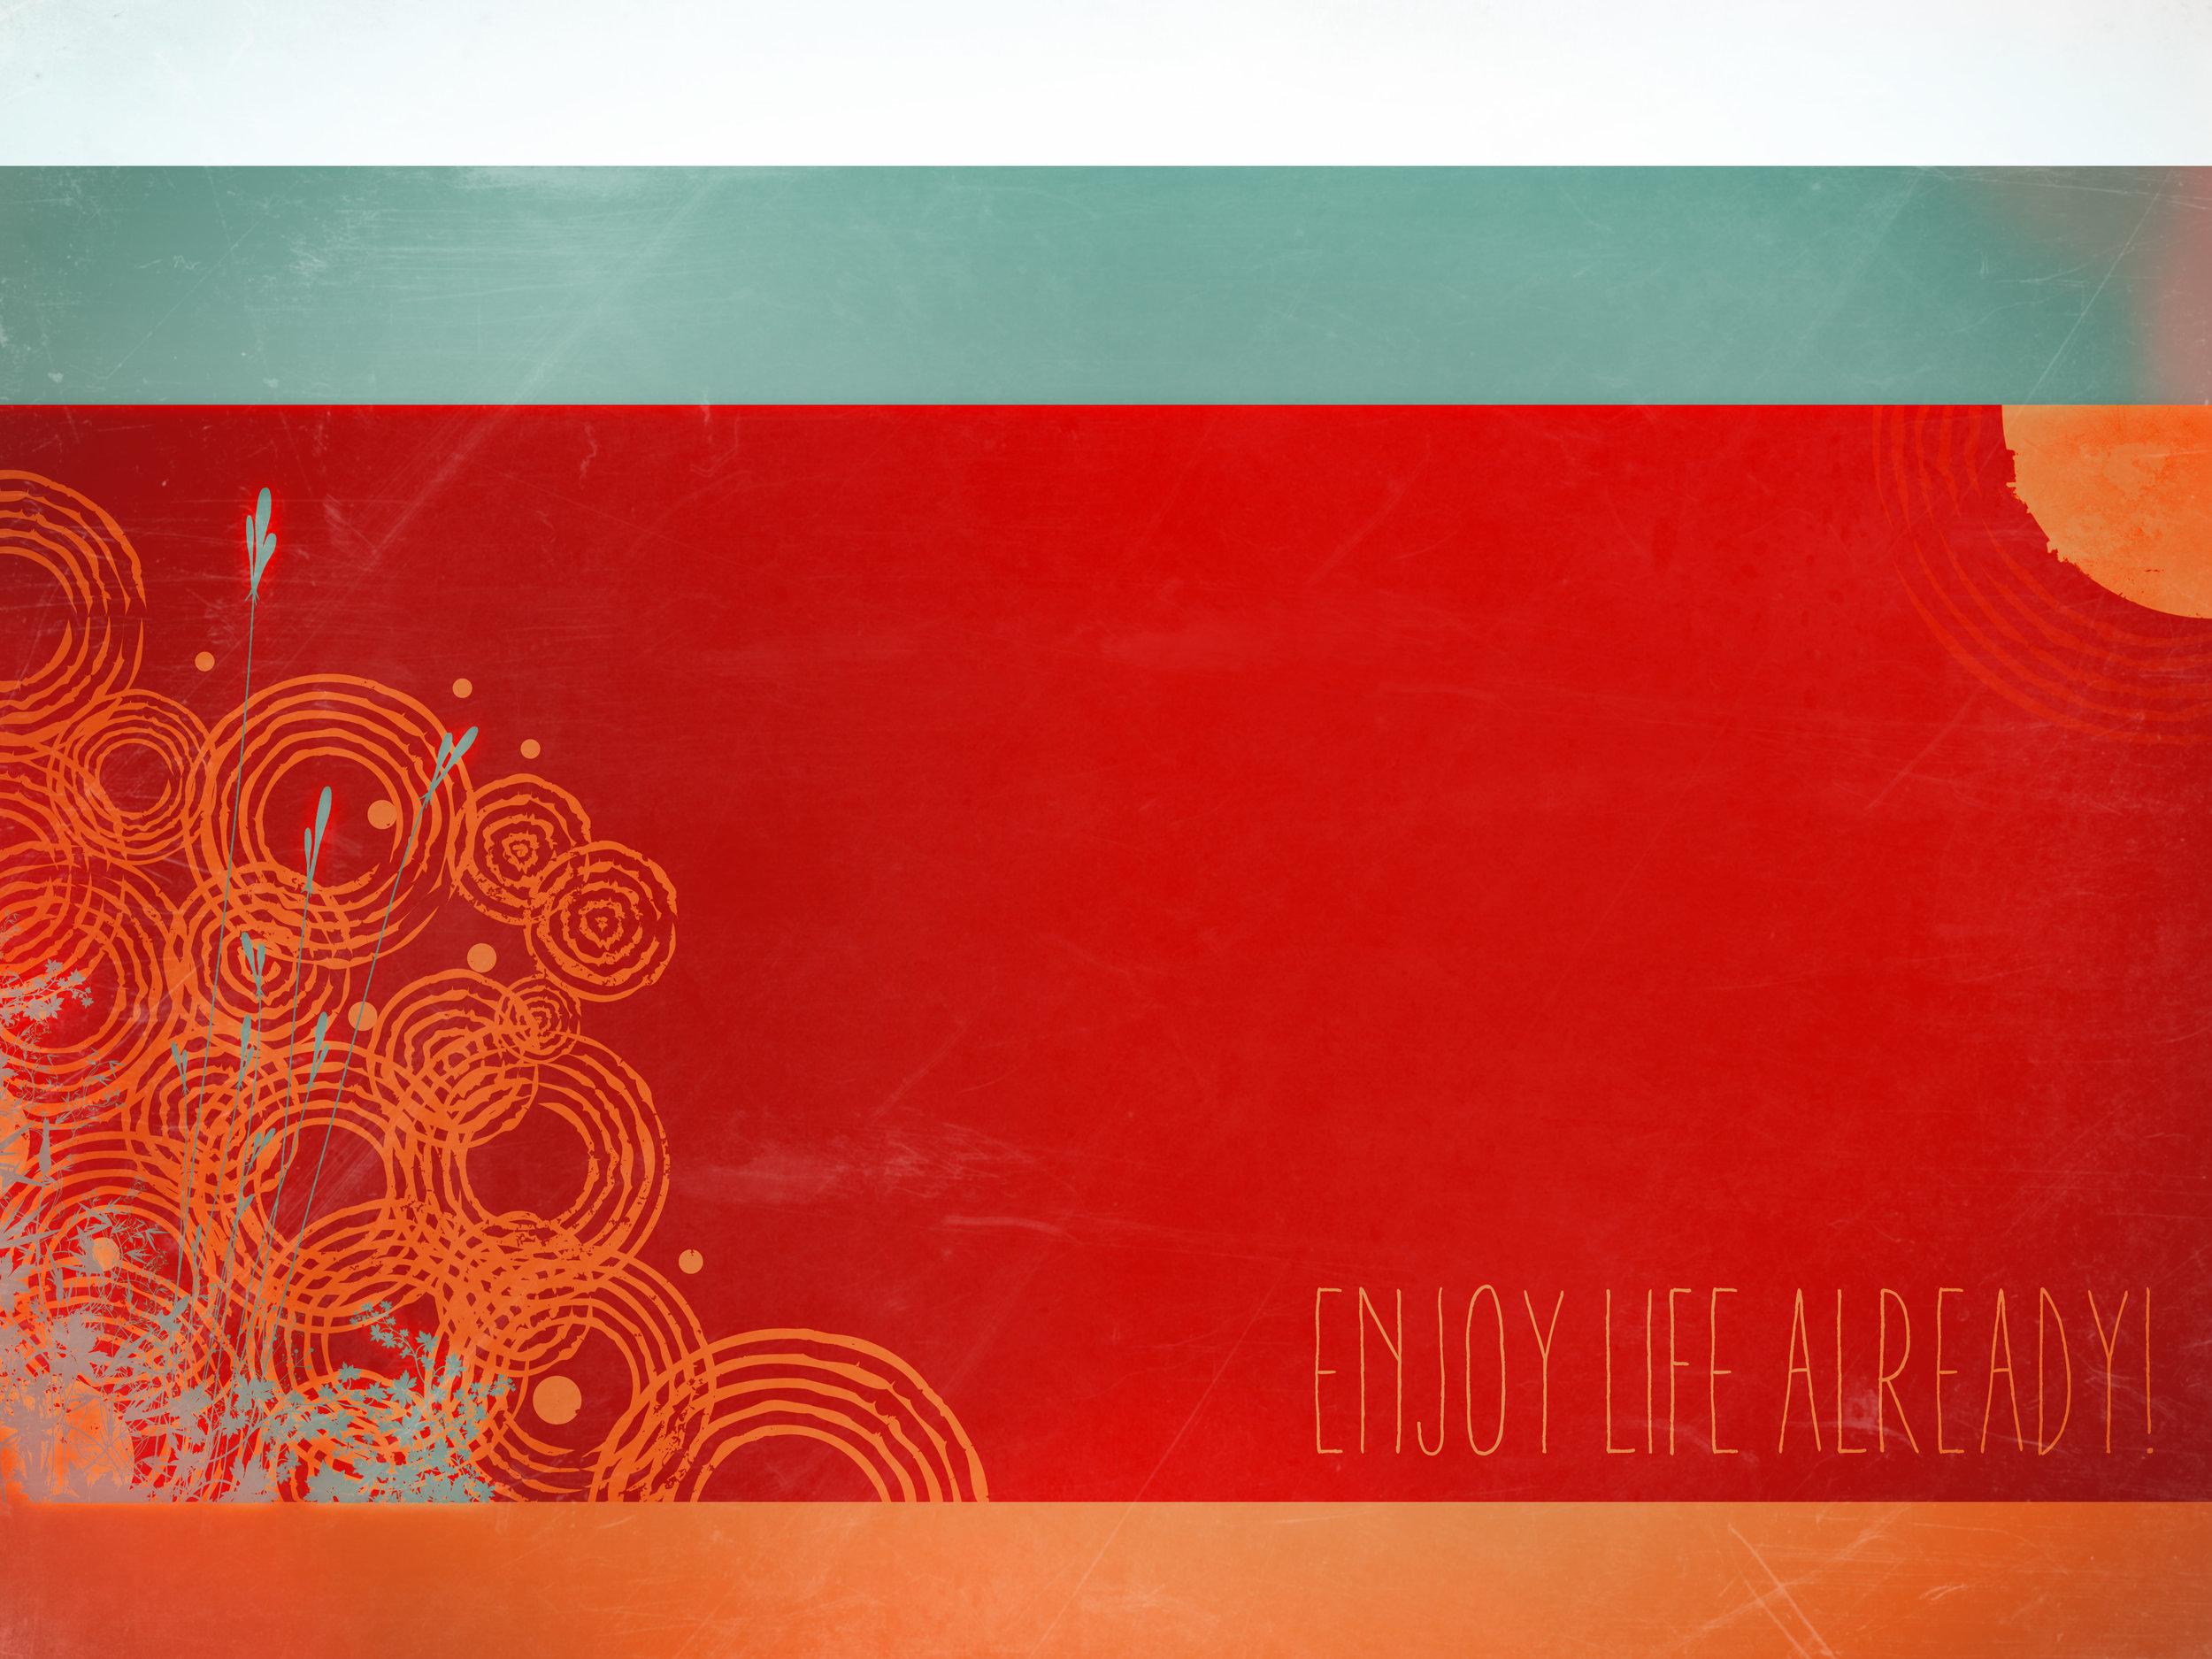 enjoylife.jpg